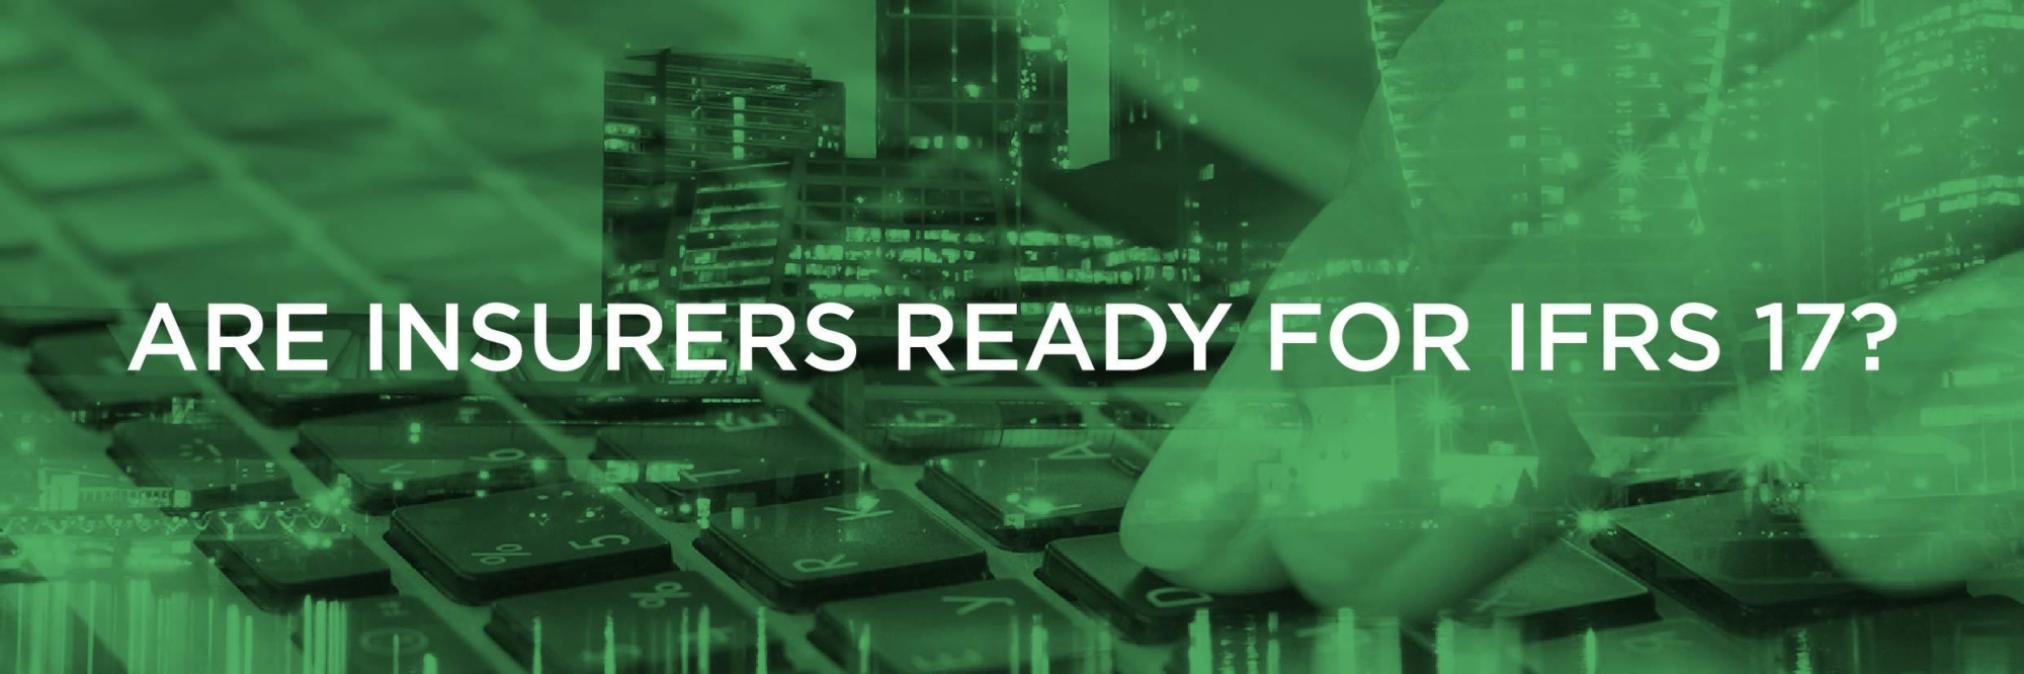 Datasheet thumbnail - IFRS Readiness and Impact